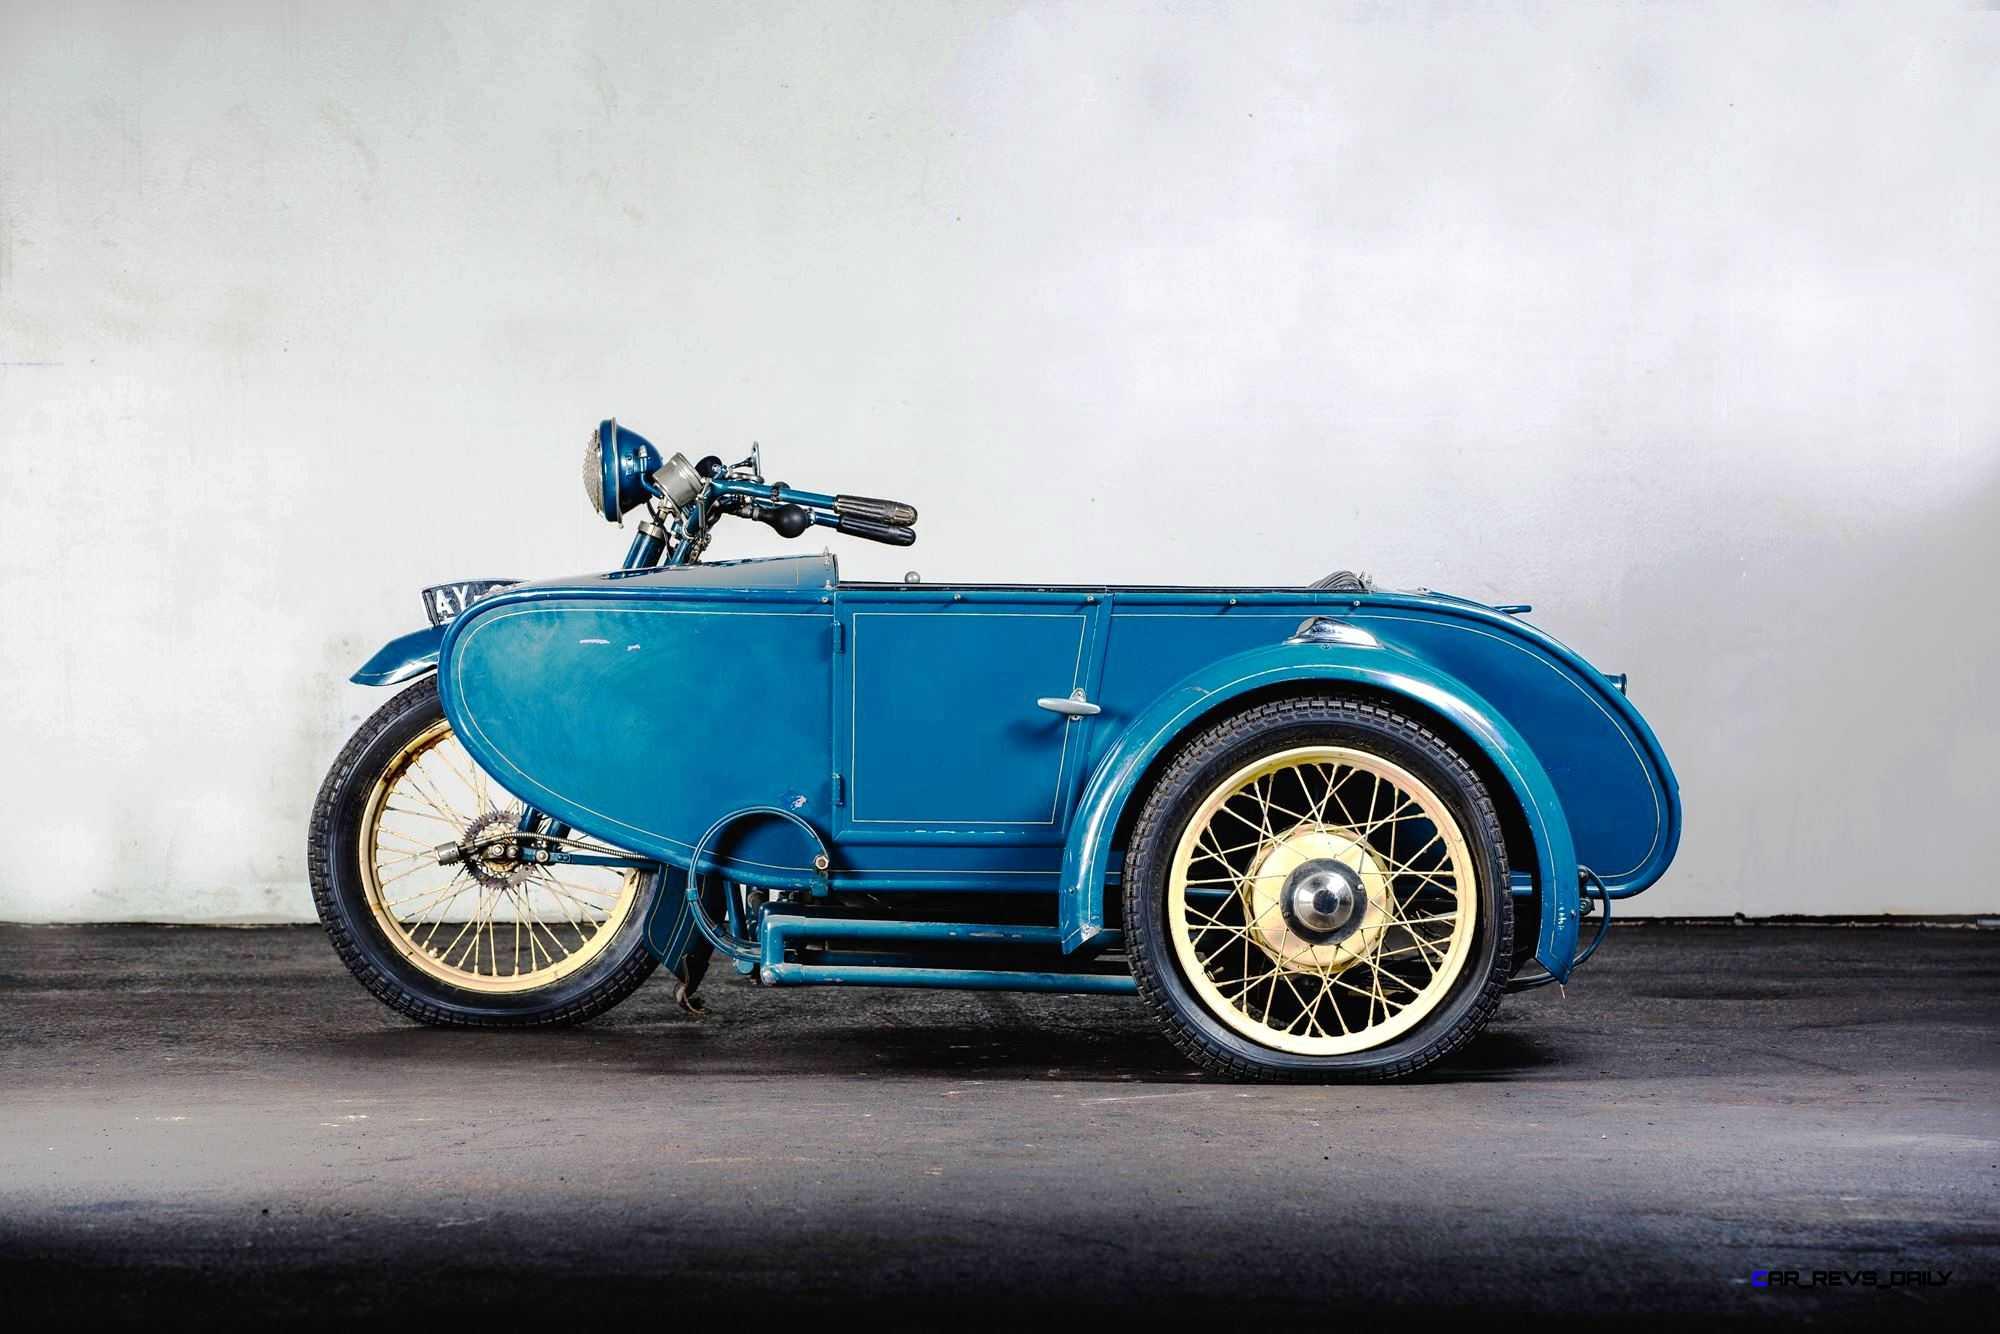 1925-Henderson-De-Luxe-with-Goulding-Sidecar.jpg